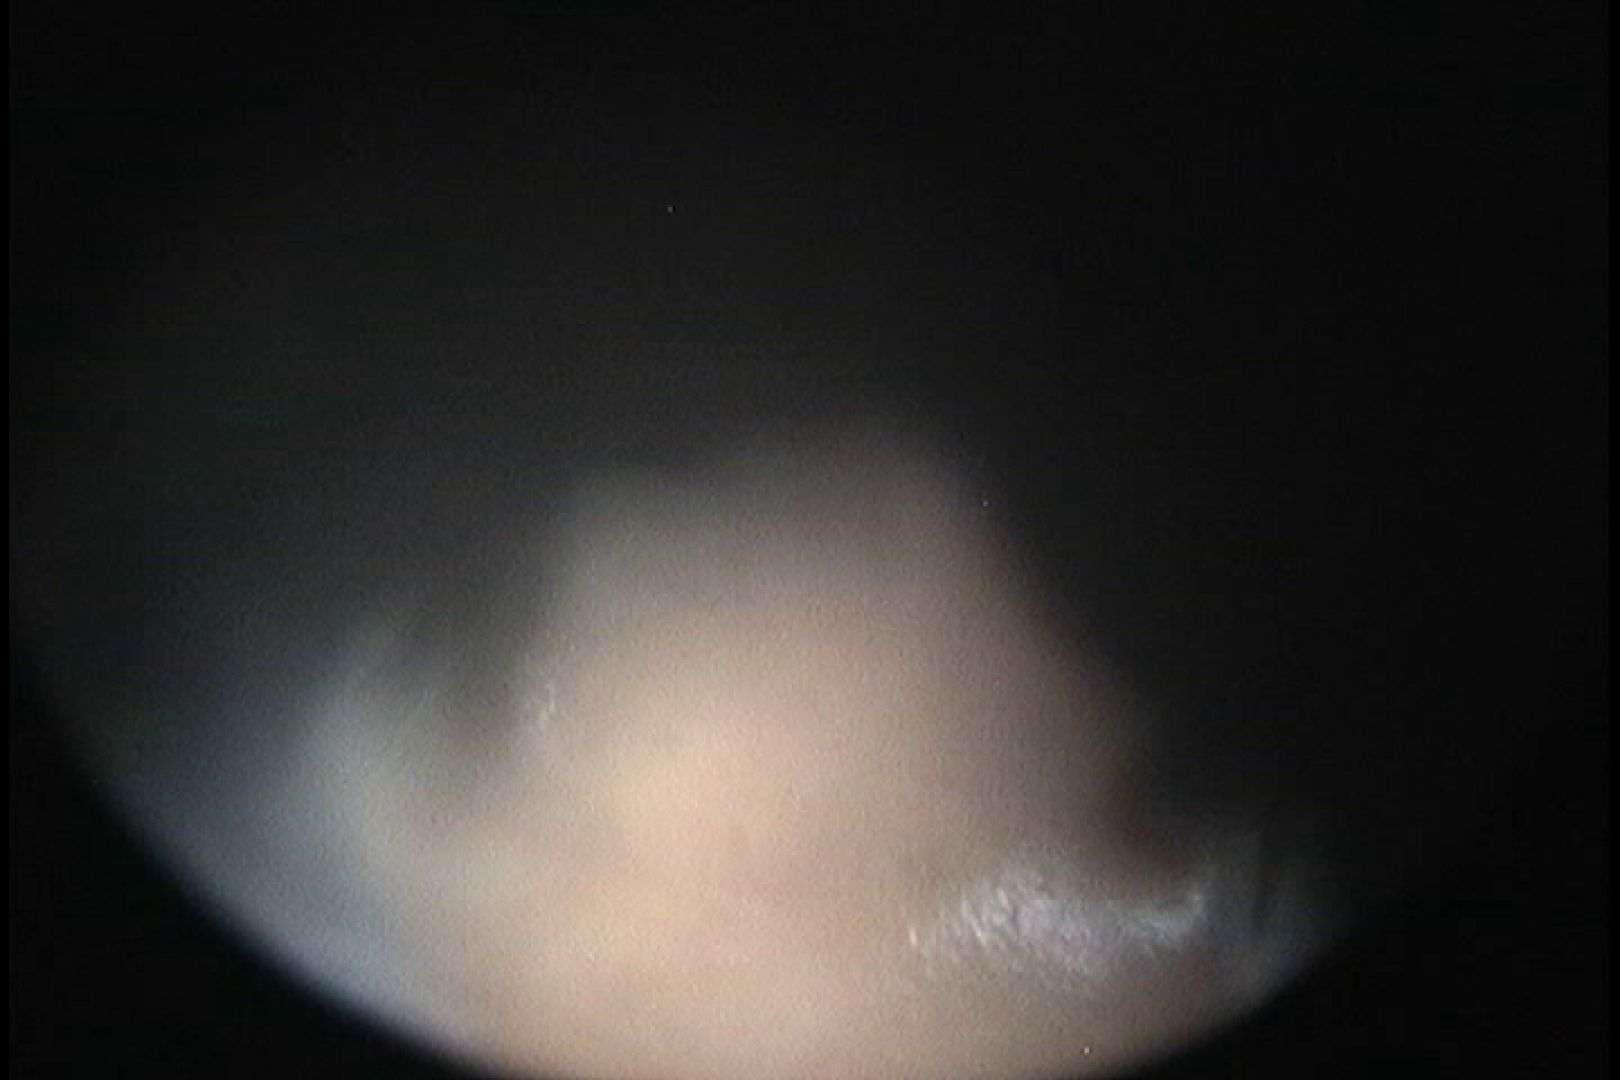 No.53 金髪ギャルの乳首に向かってズームイン ギャル攻め 戯れ無修正画像 98画像 74